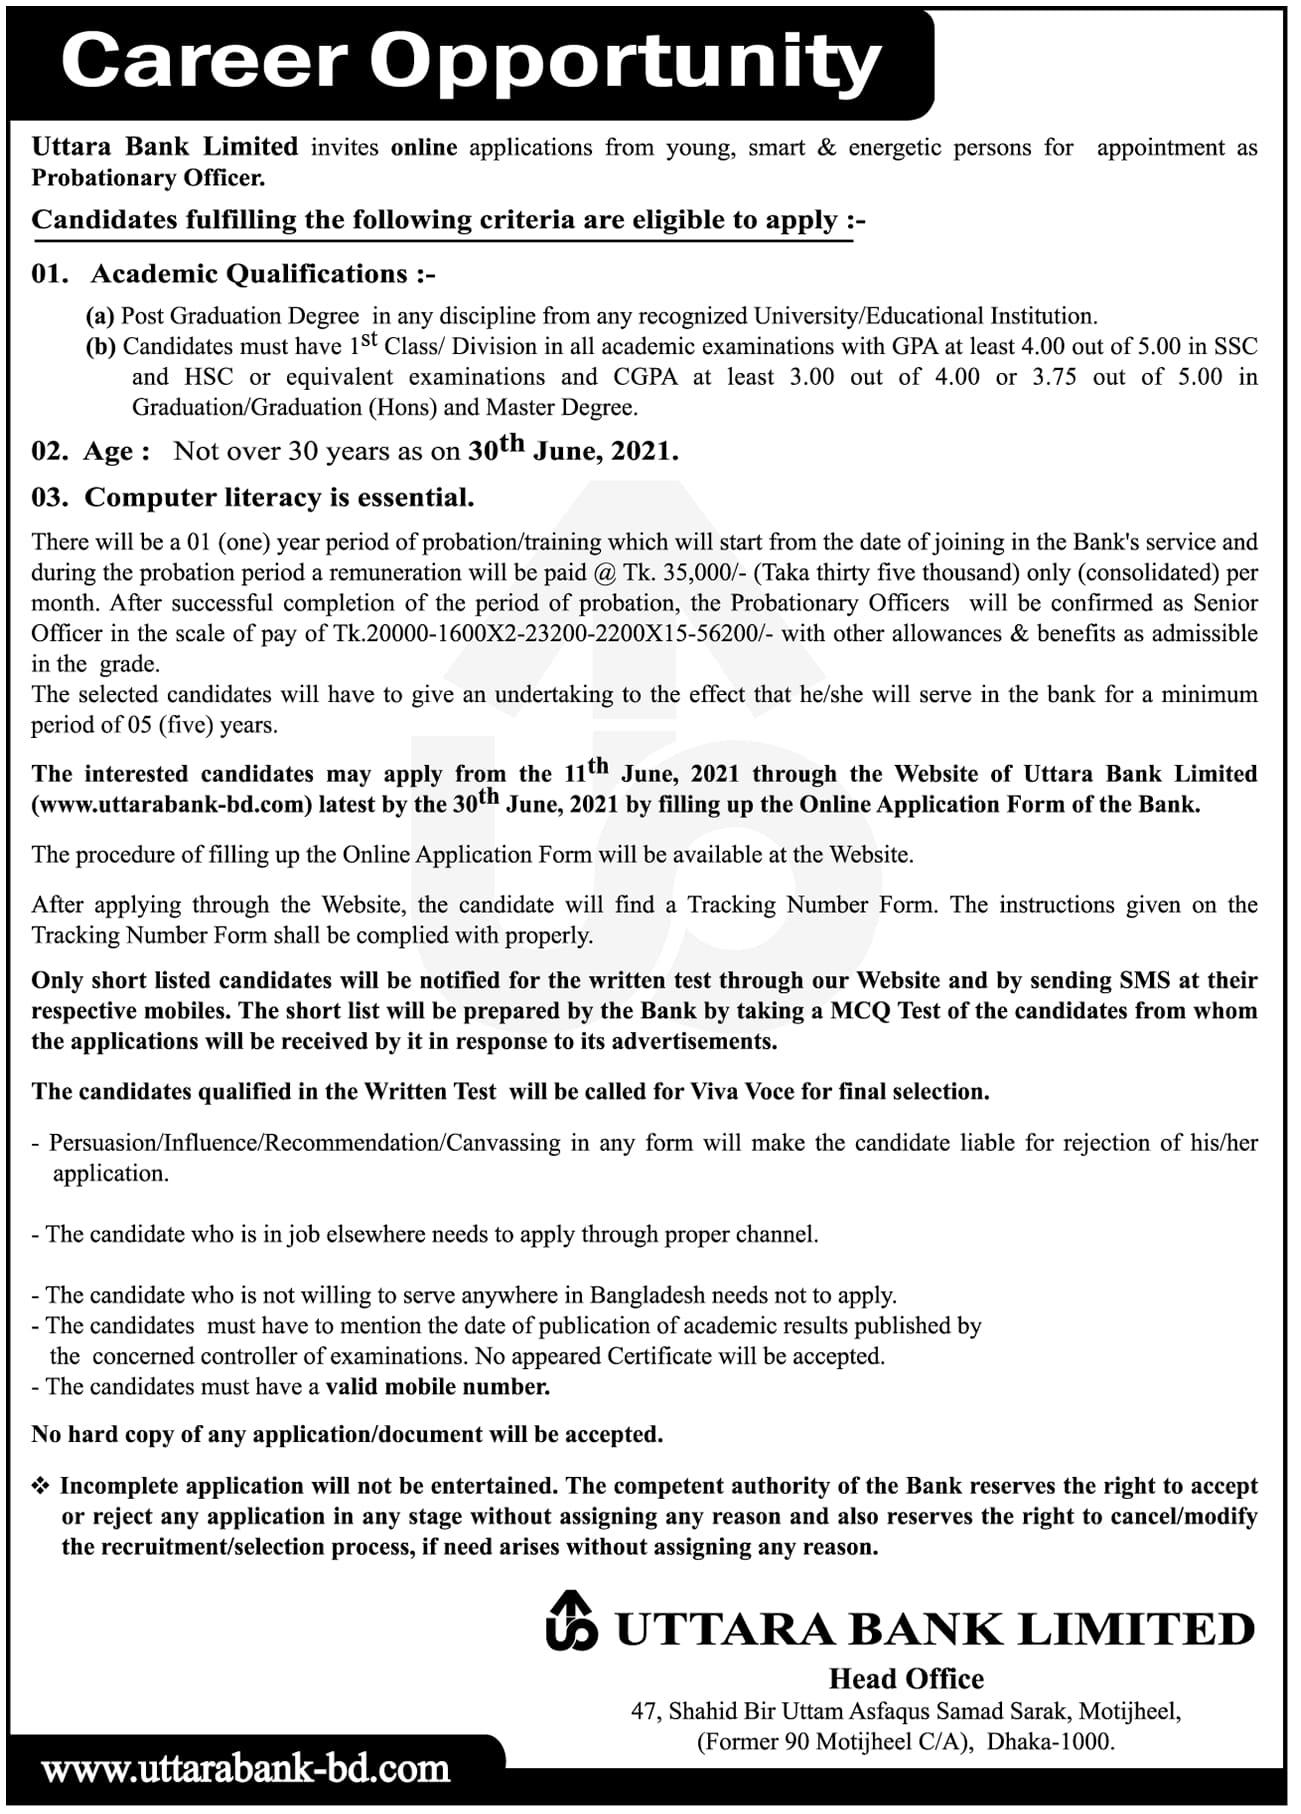 uttara-bank-limited-job-circular-2021